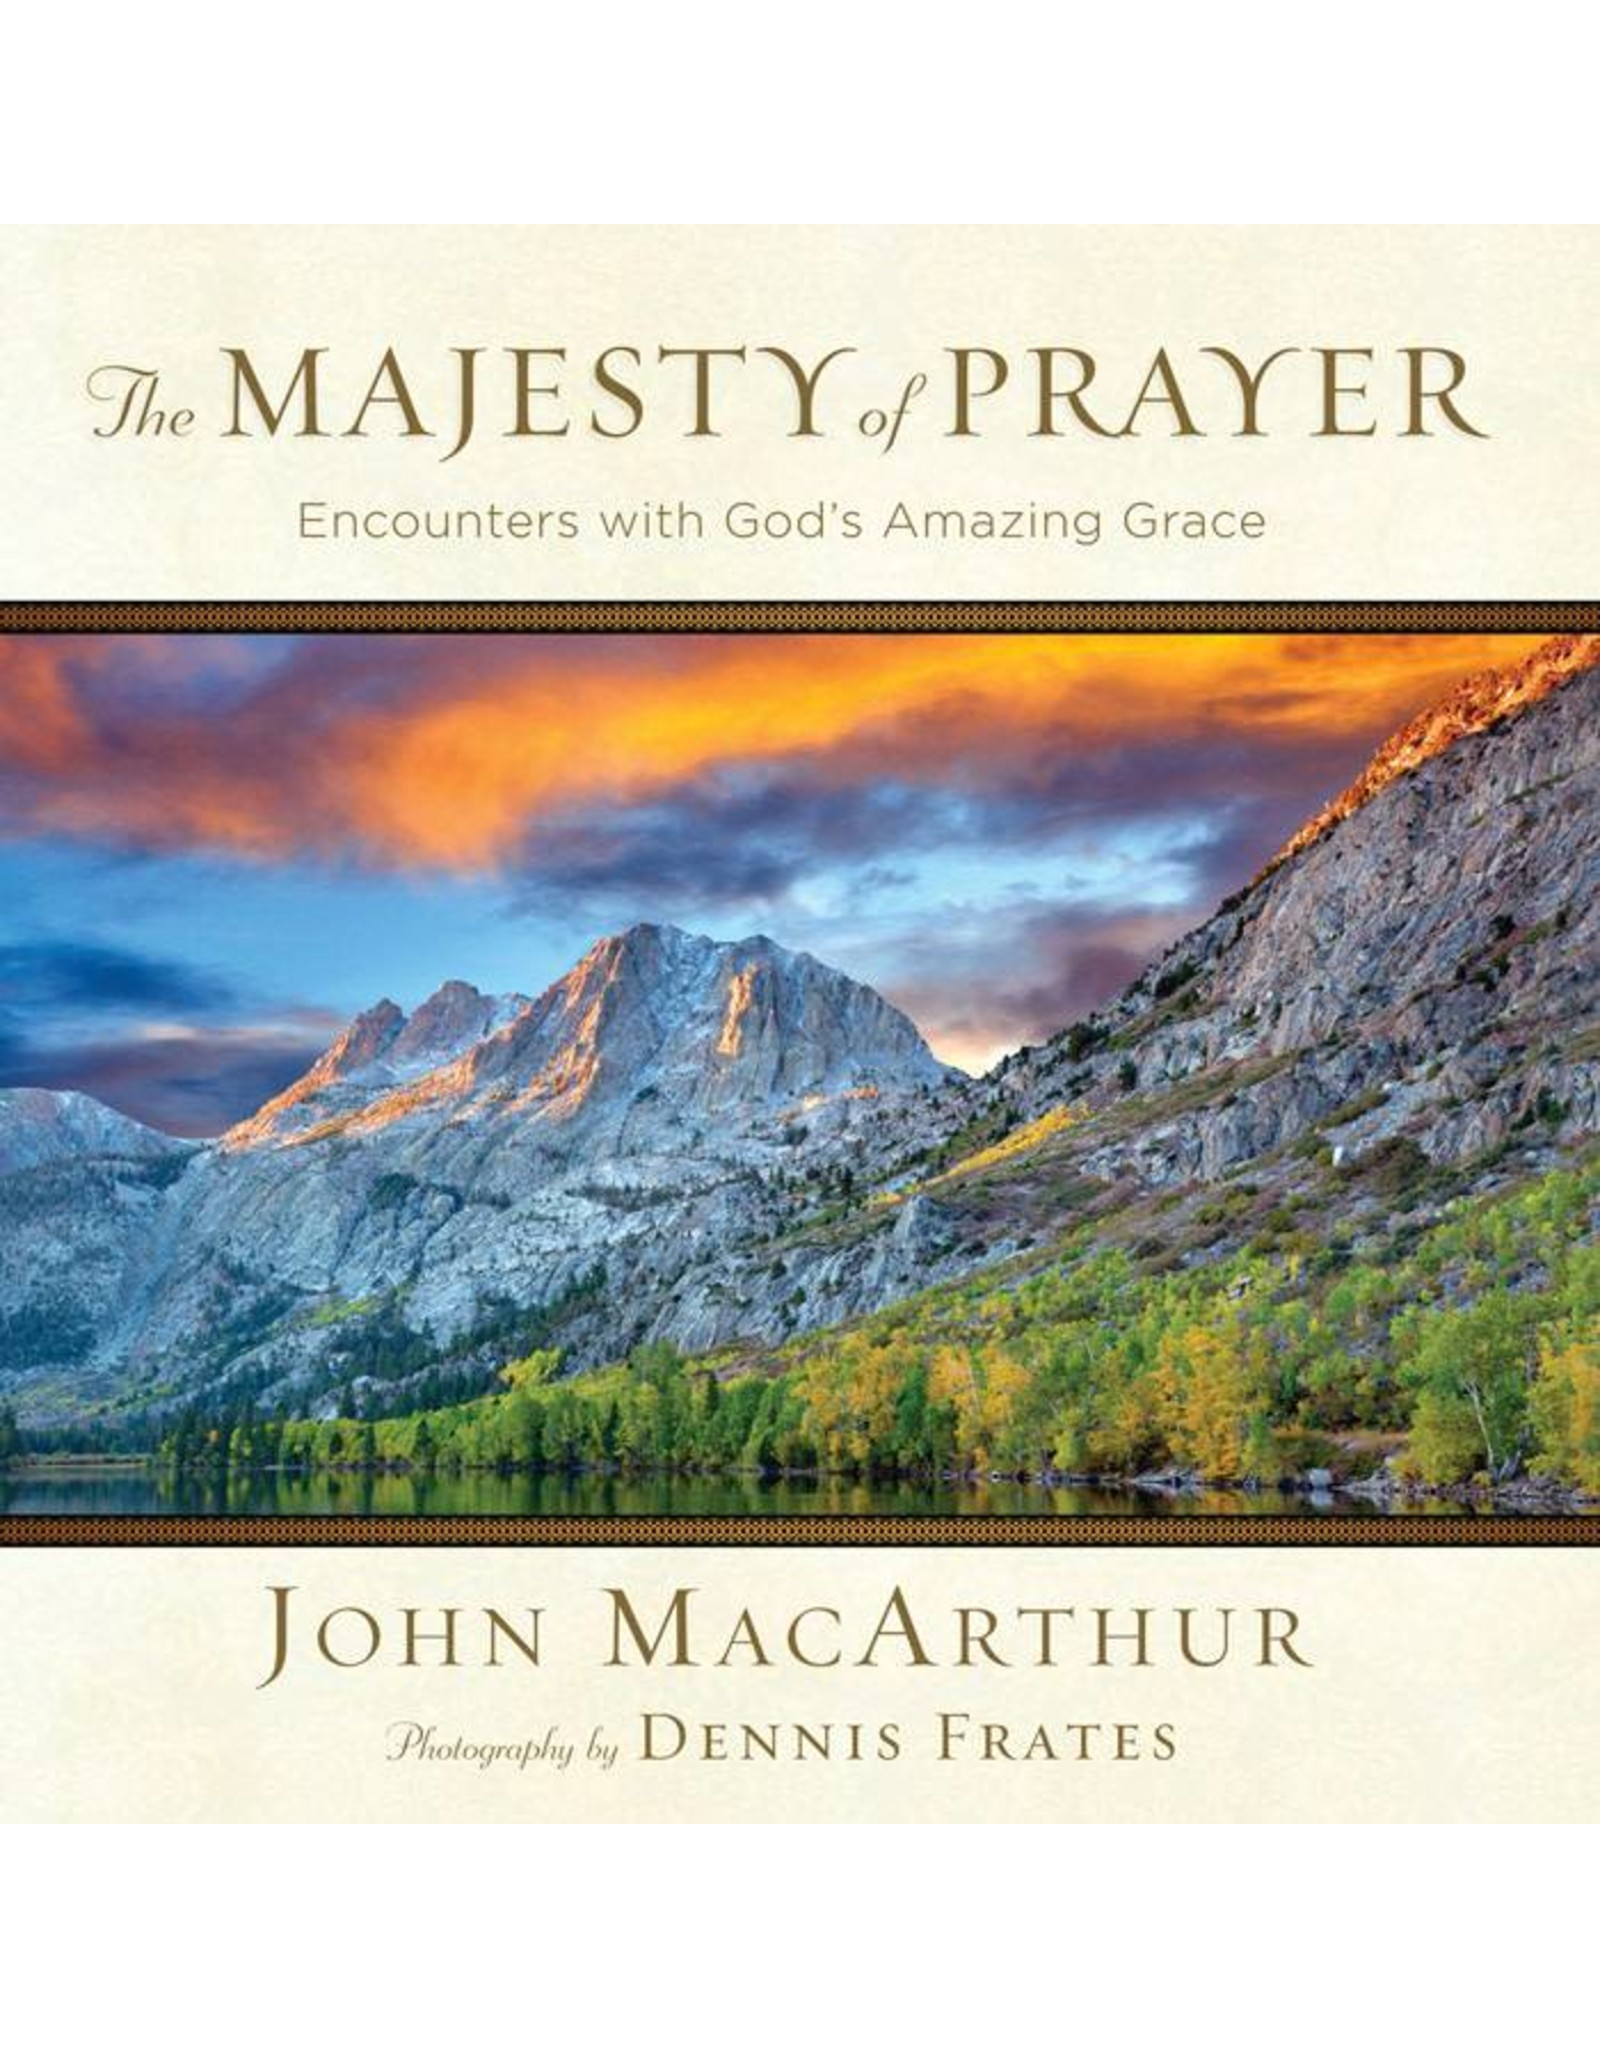 Harvest House Publishers The Majesty of Prayer: Encounters with God's Amazing Grace